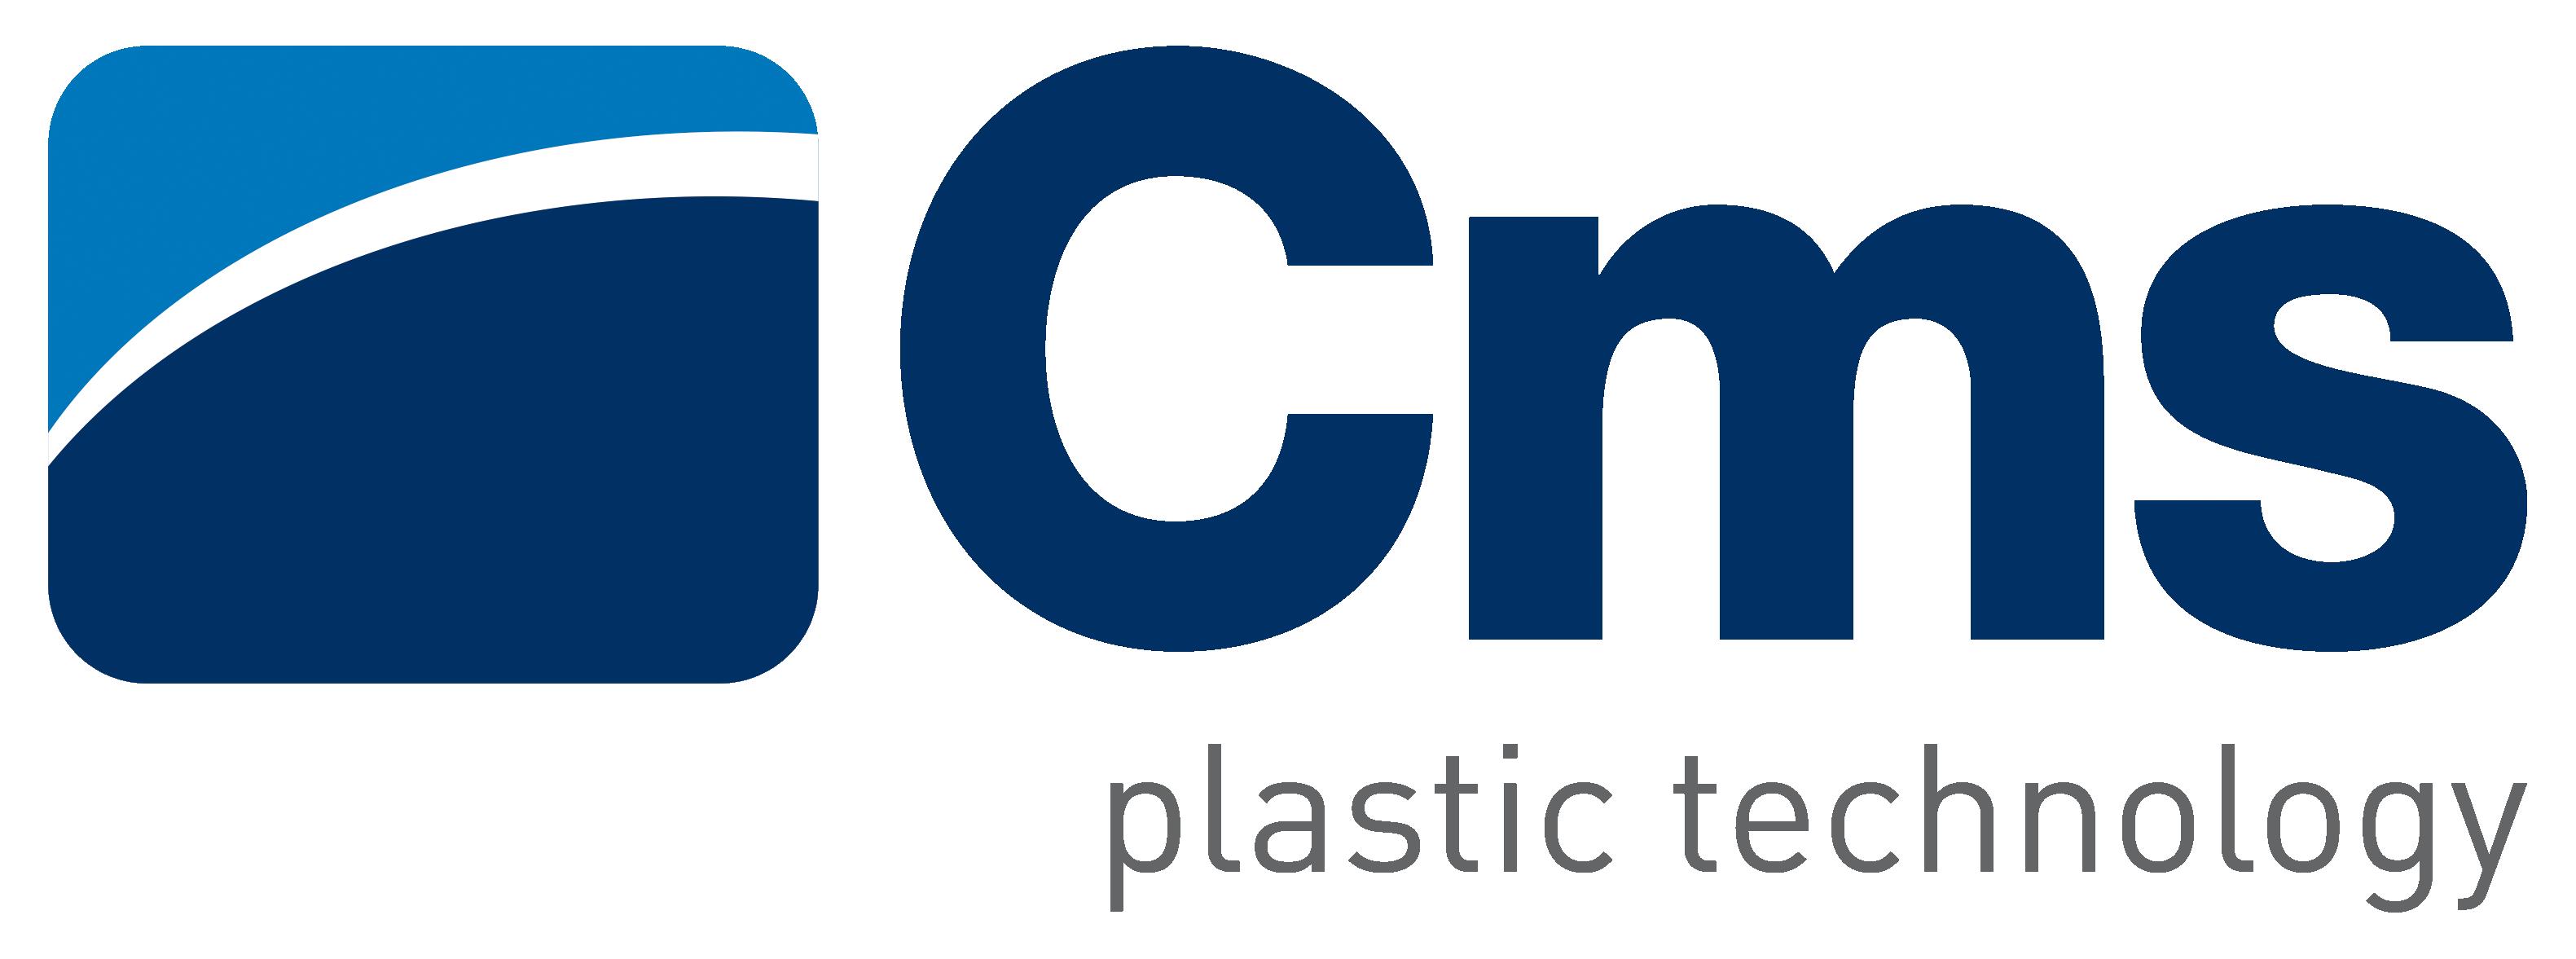 CMS_PLASTIC_LOGO